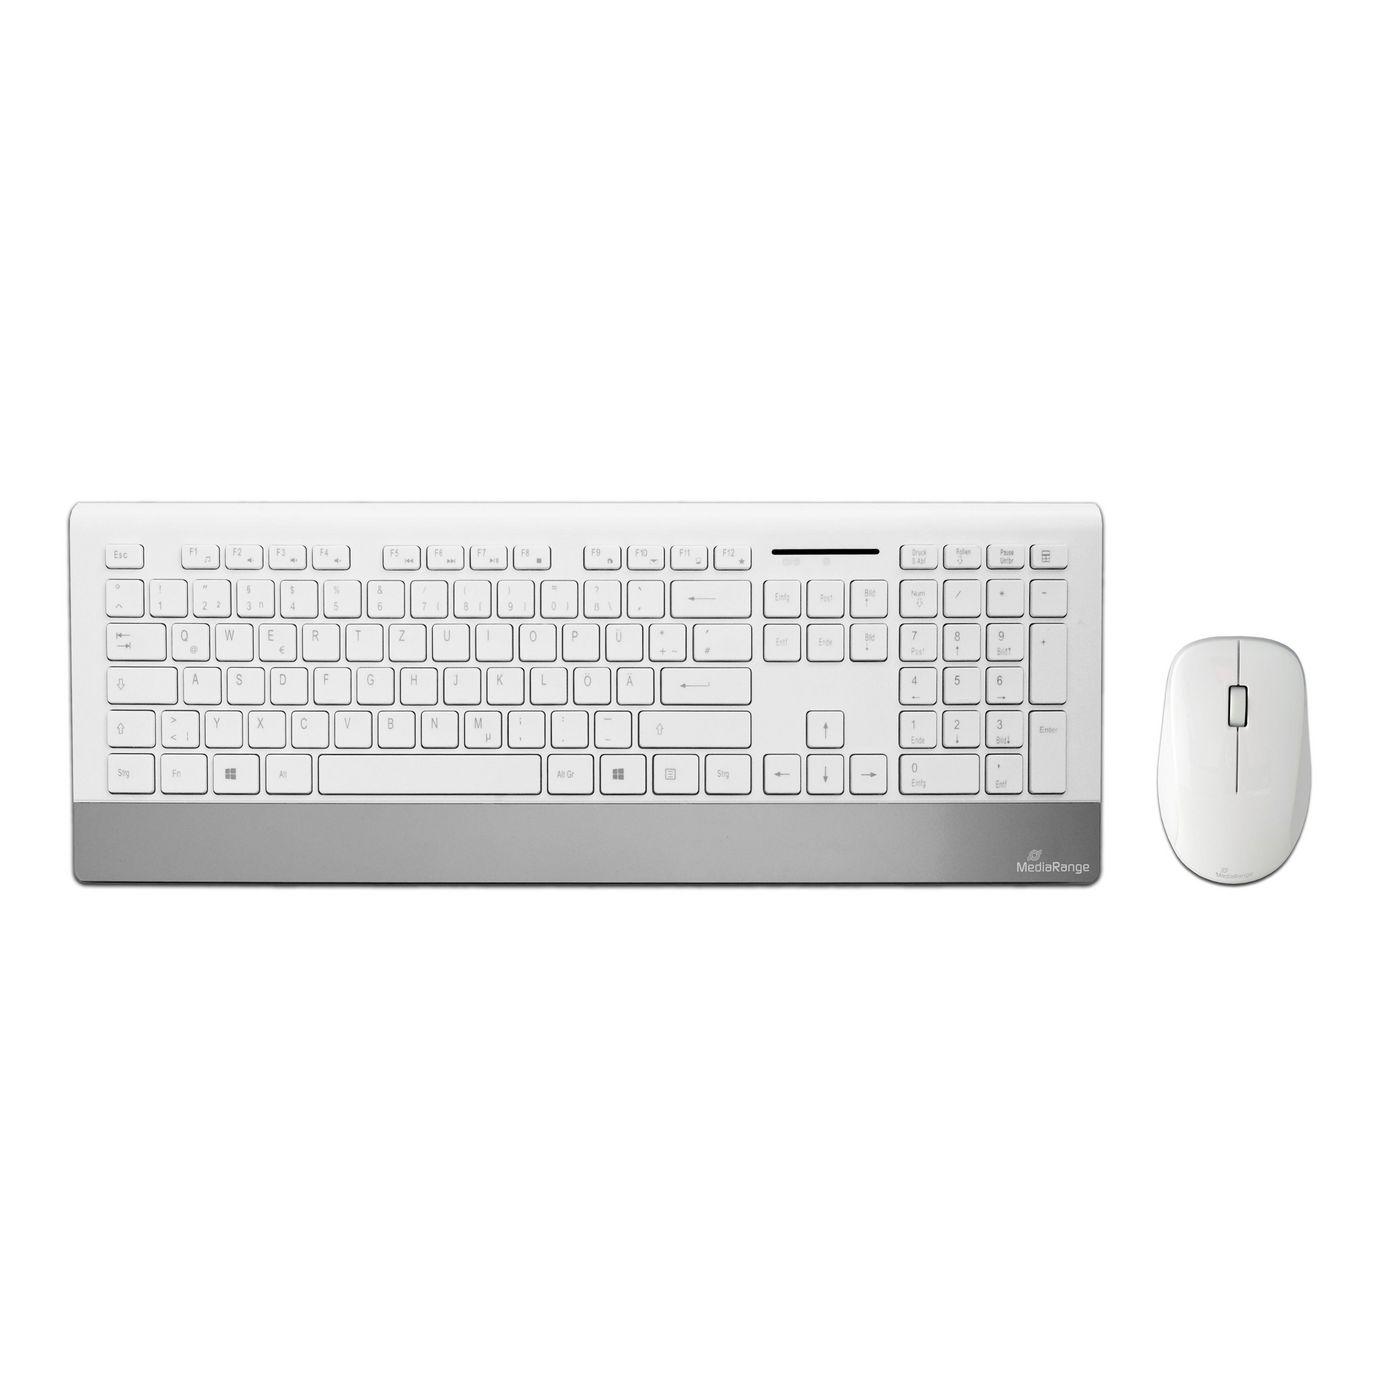 MediaRange MROS106 Tastatur Highline schnurlos